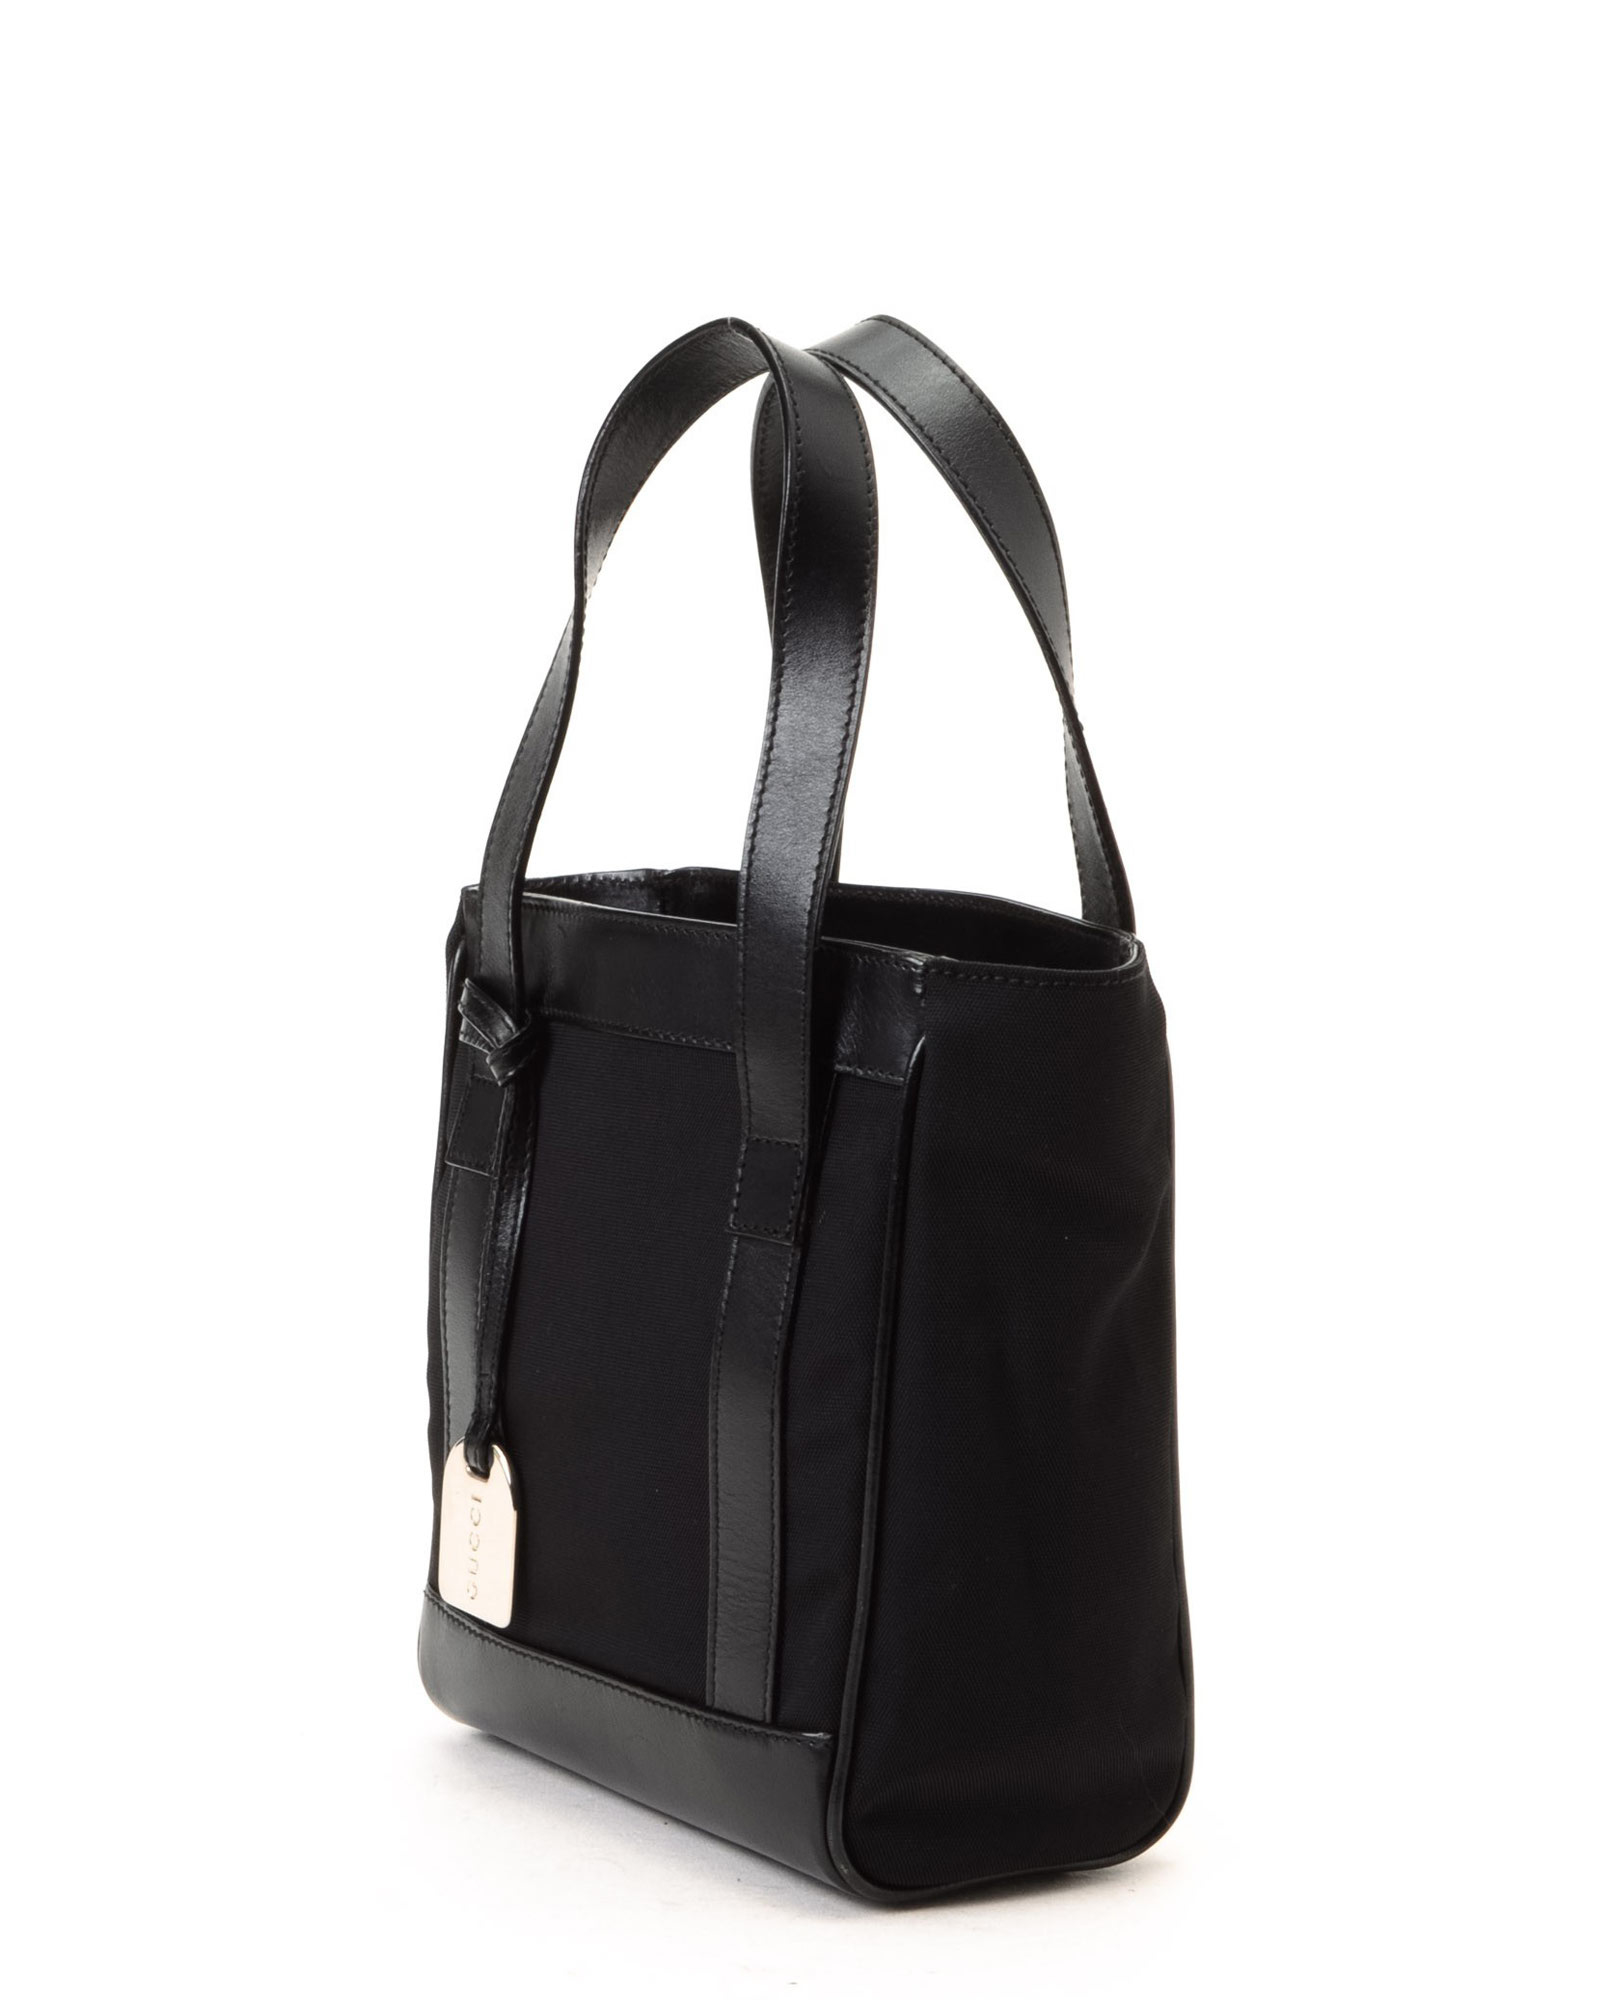 Gucci Black Nylon Tote Bag - Vintage in Black | Lyst